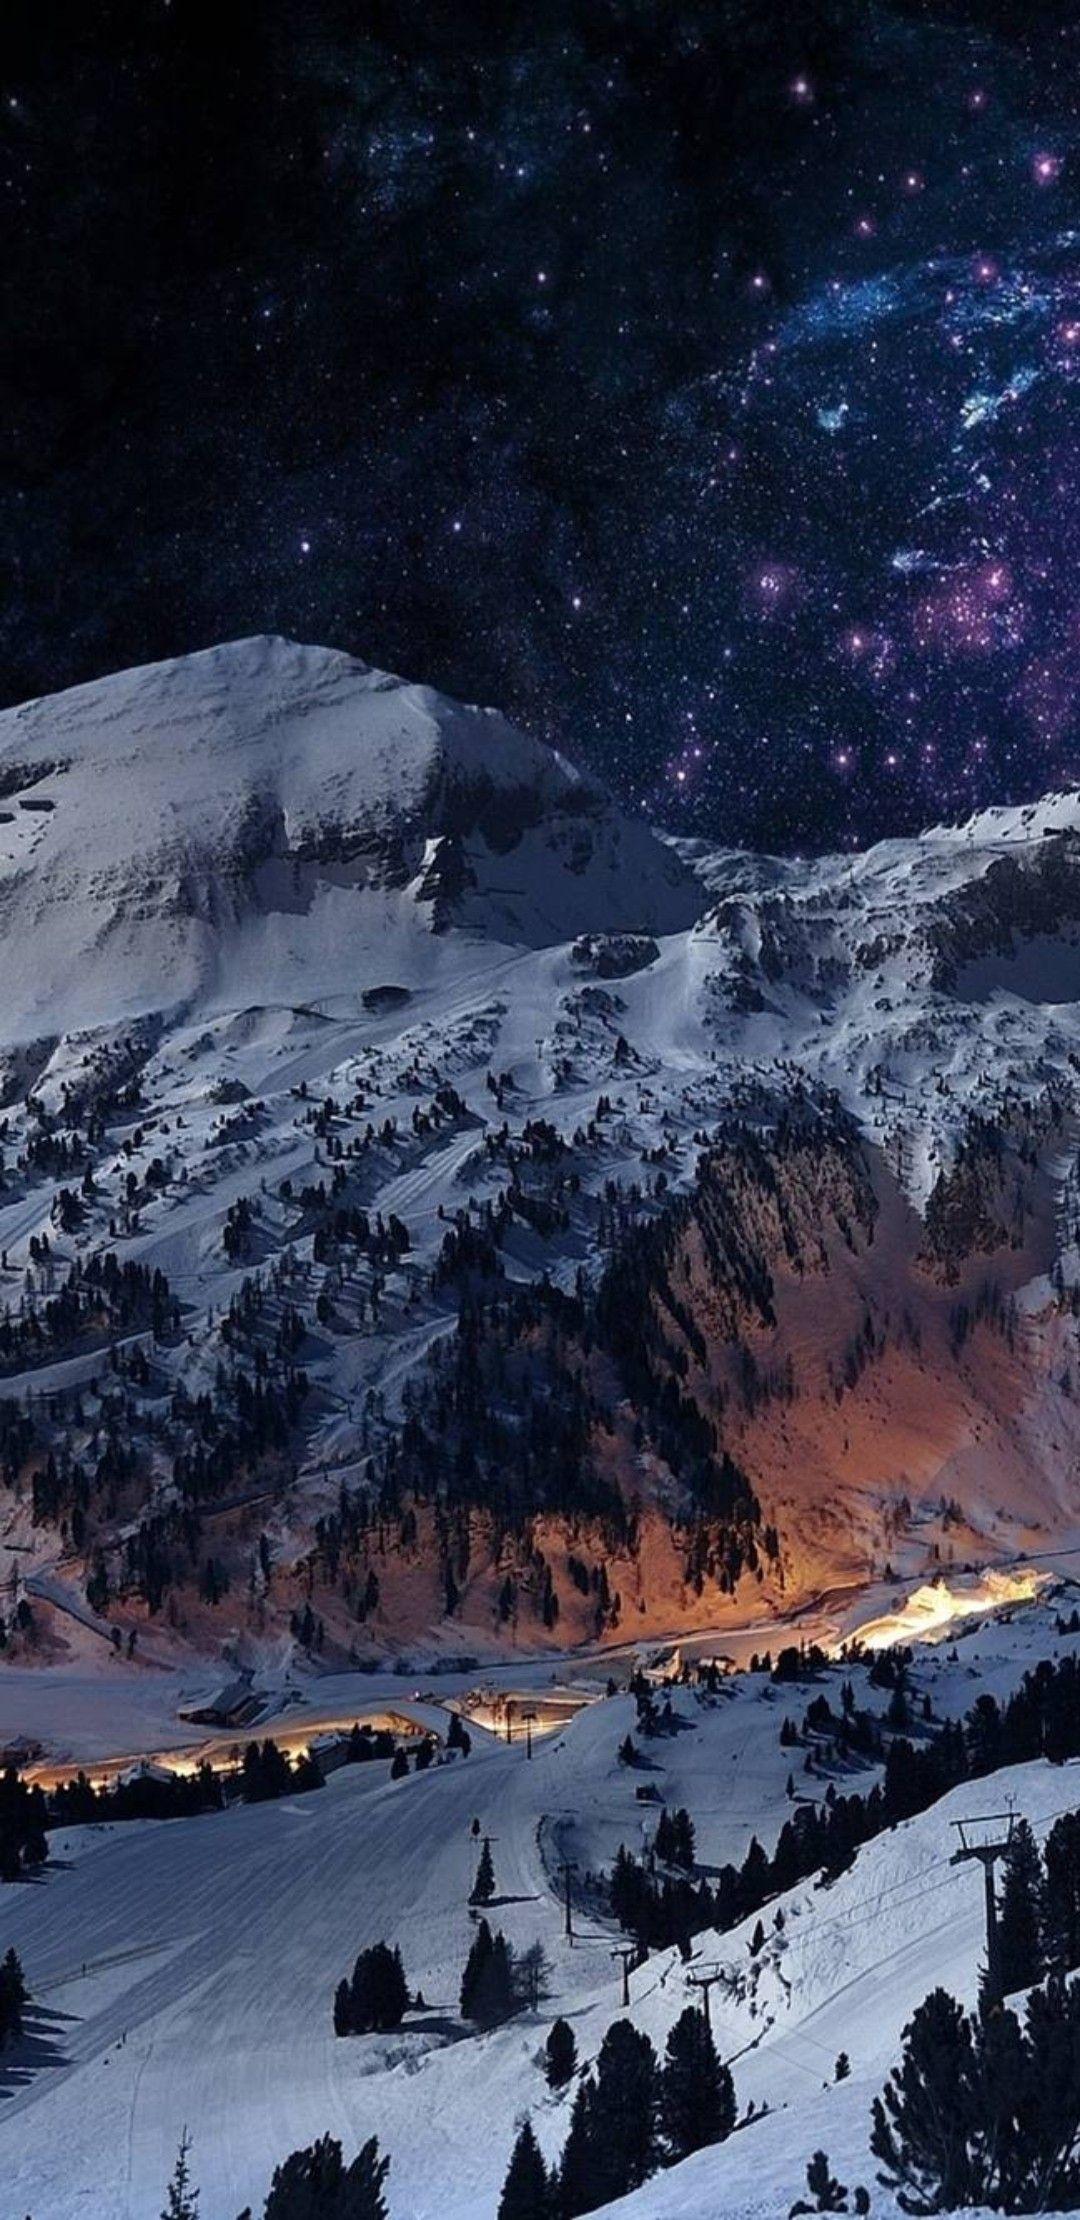 Winter Village Iphone Wallpaper